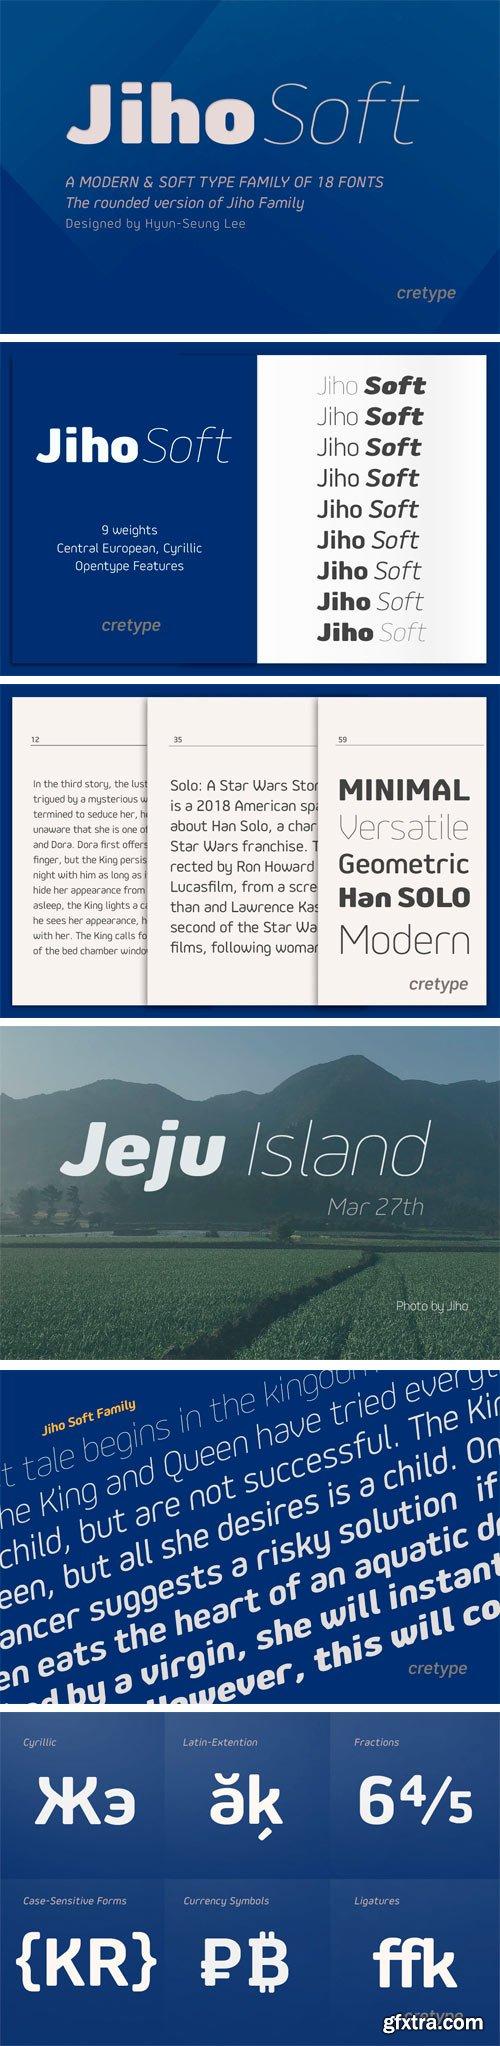 Jiho Soft Font Family